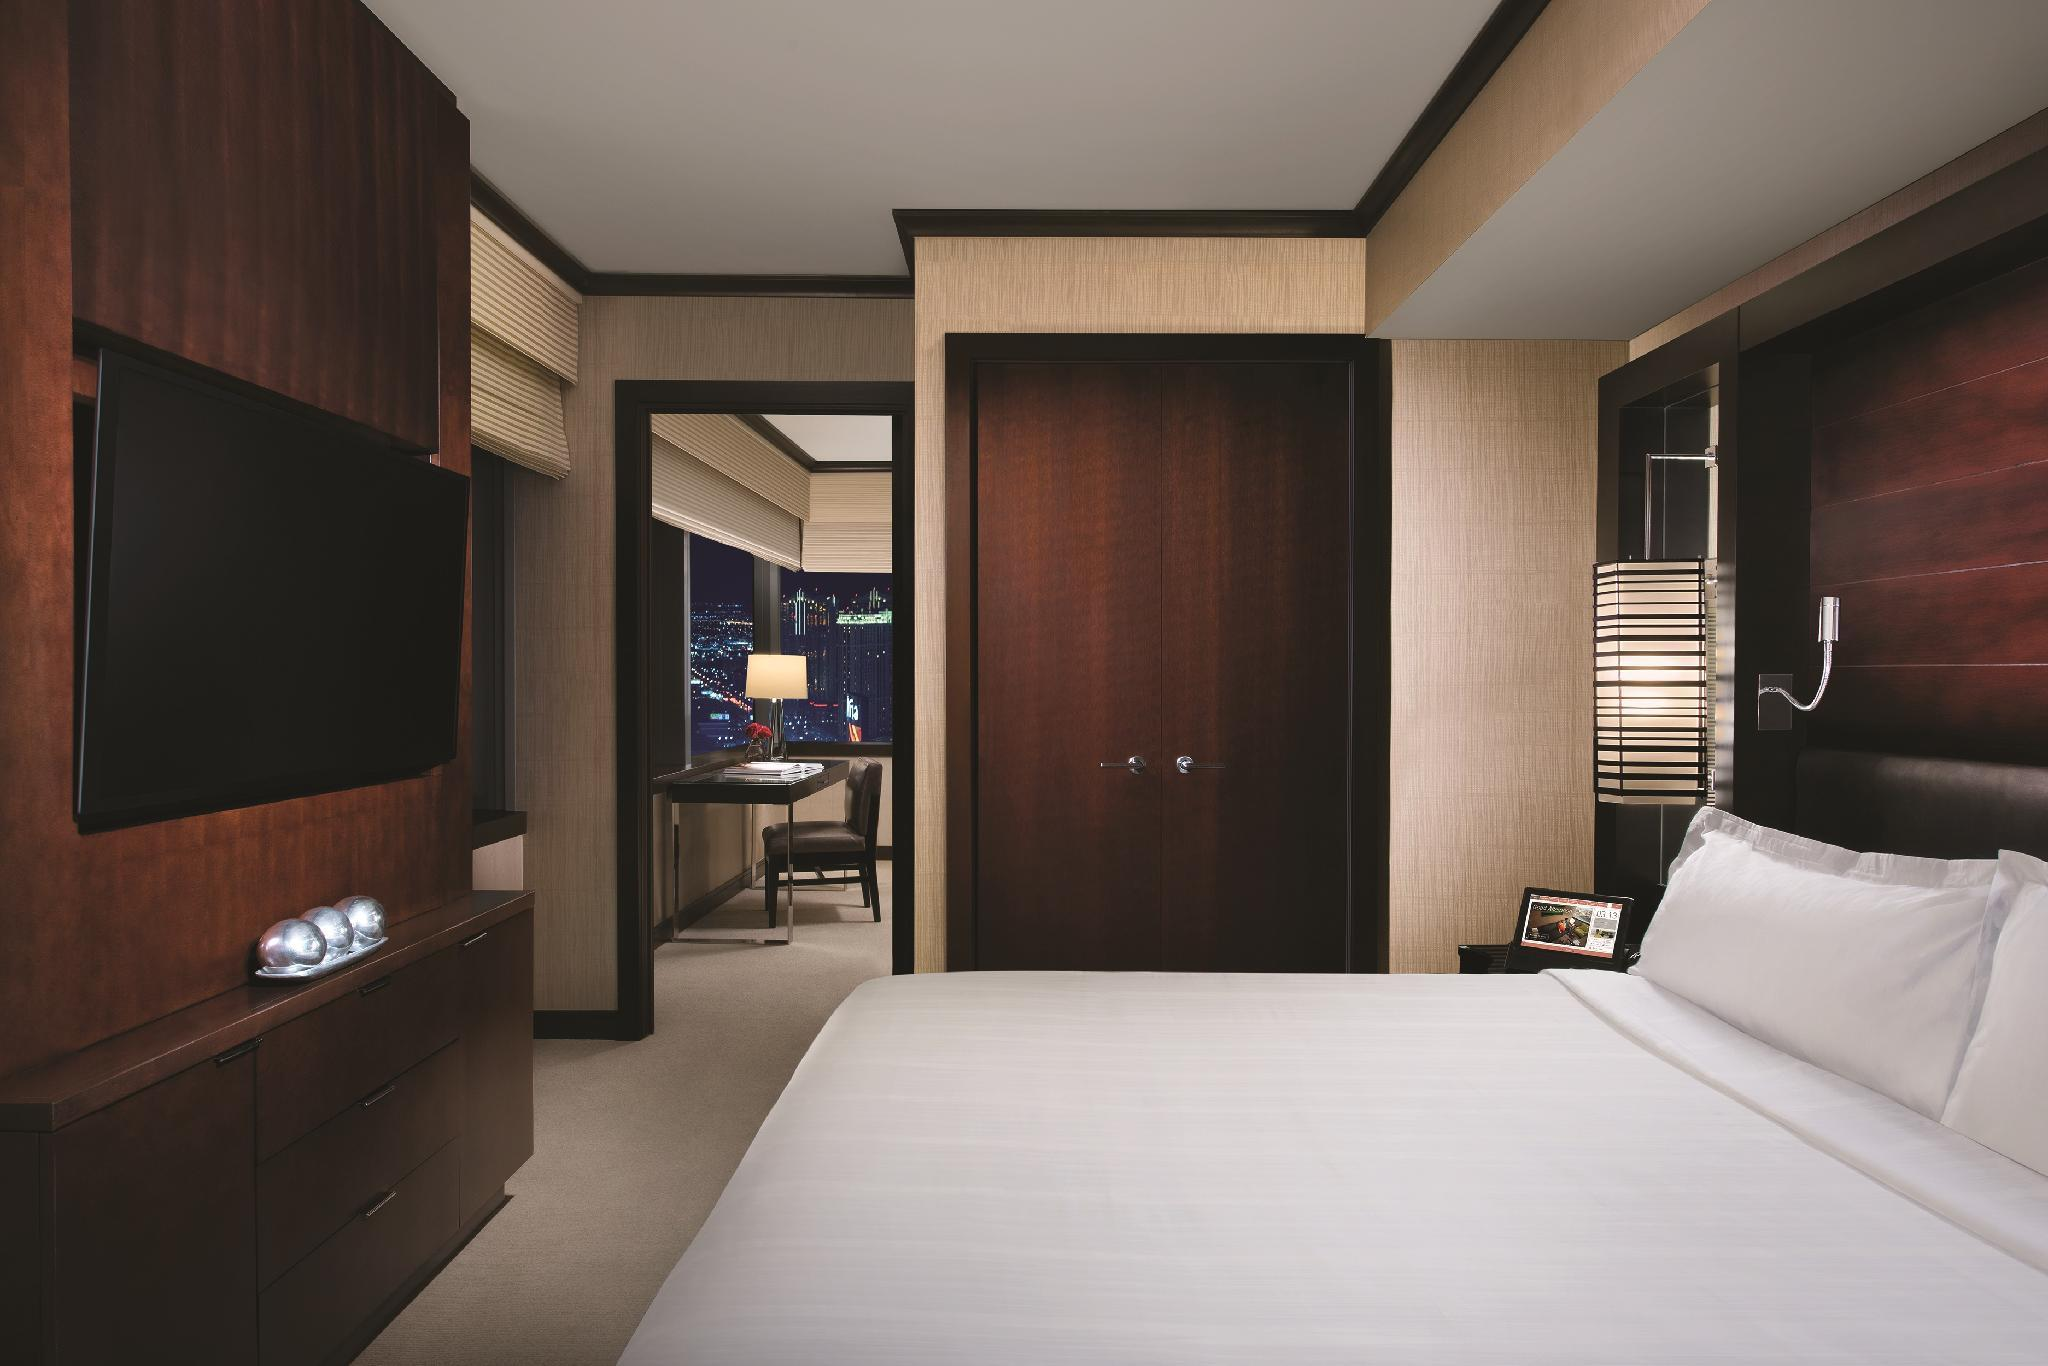 Vdara Hotel Amp Spa At Aria Las Vegas In Las Vegas Nv